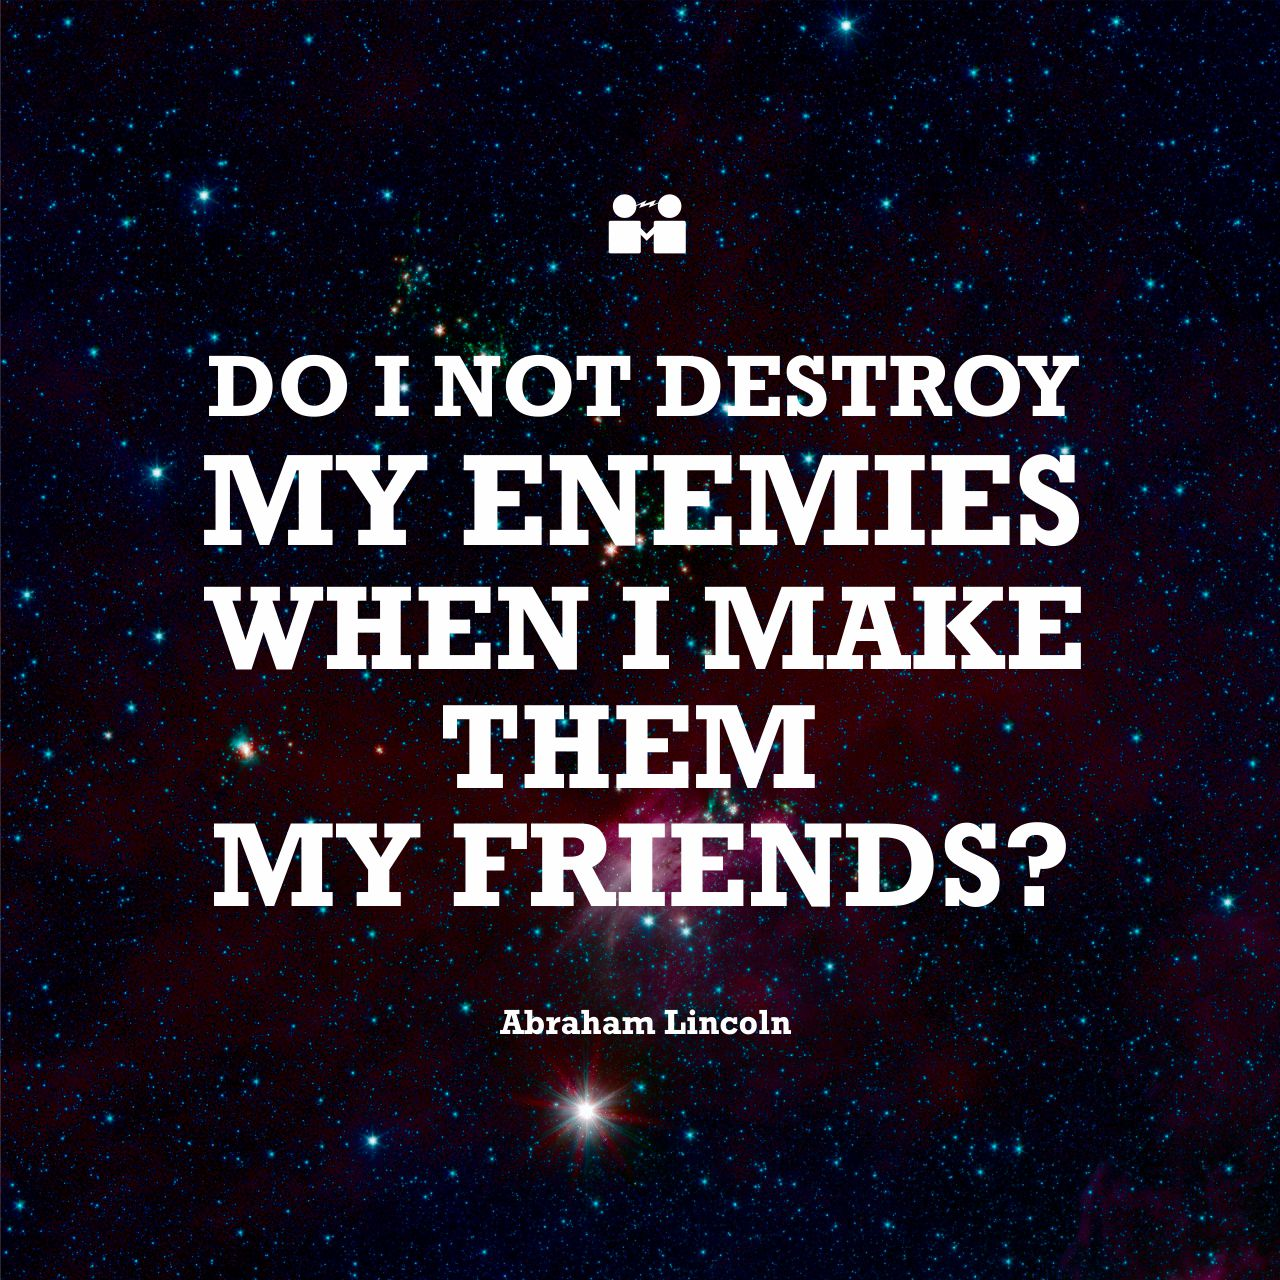 destroy you enemy by making them